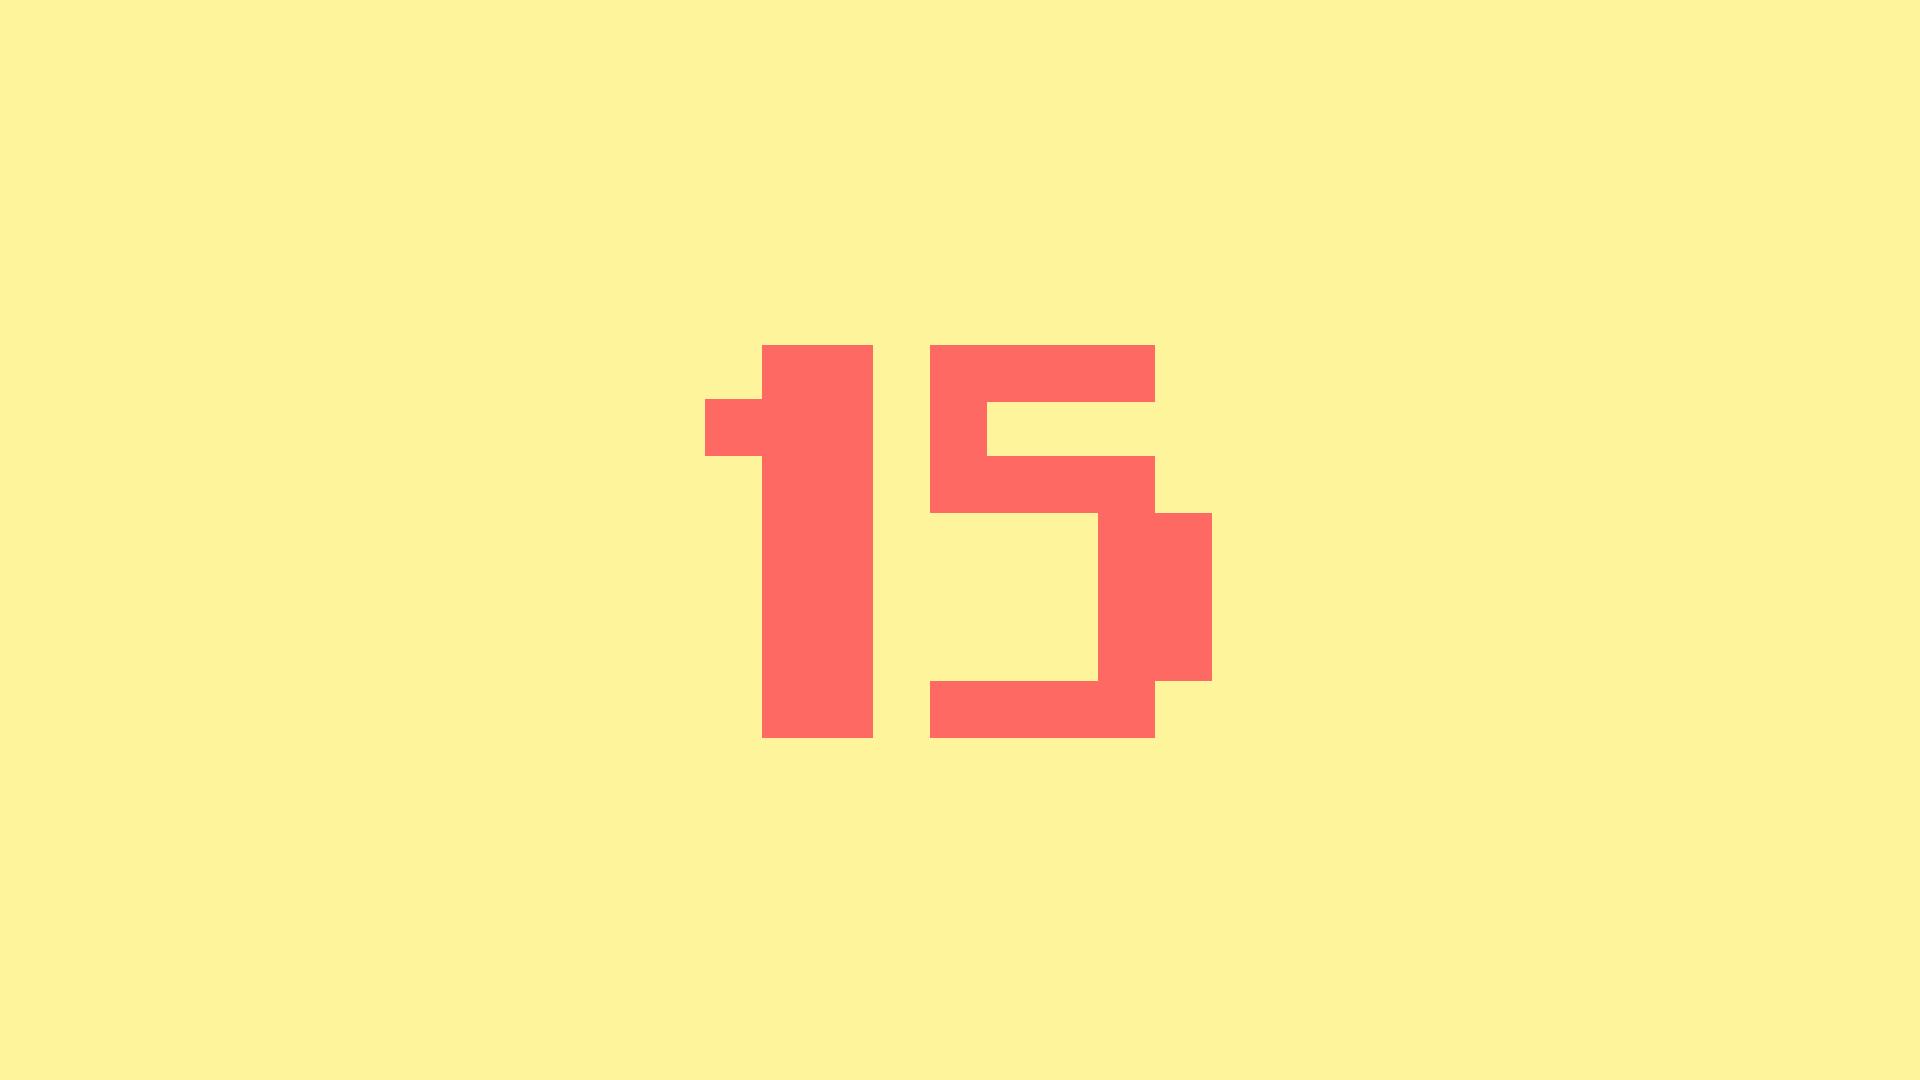 Level 15!